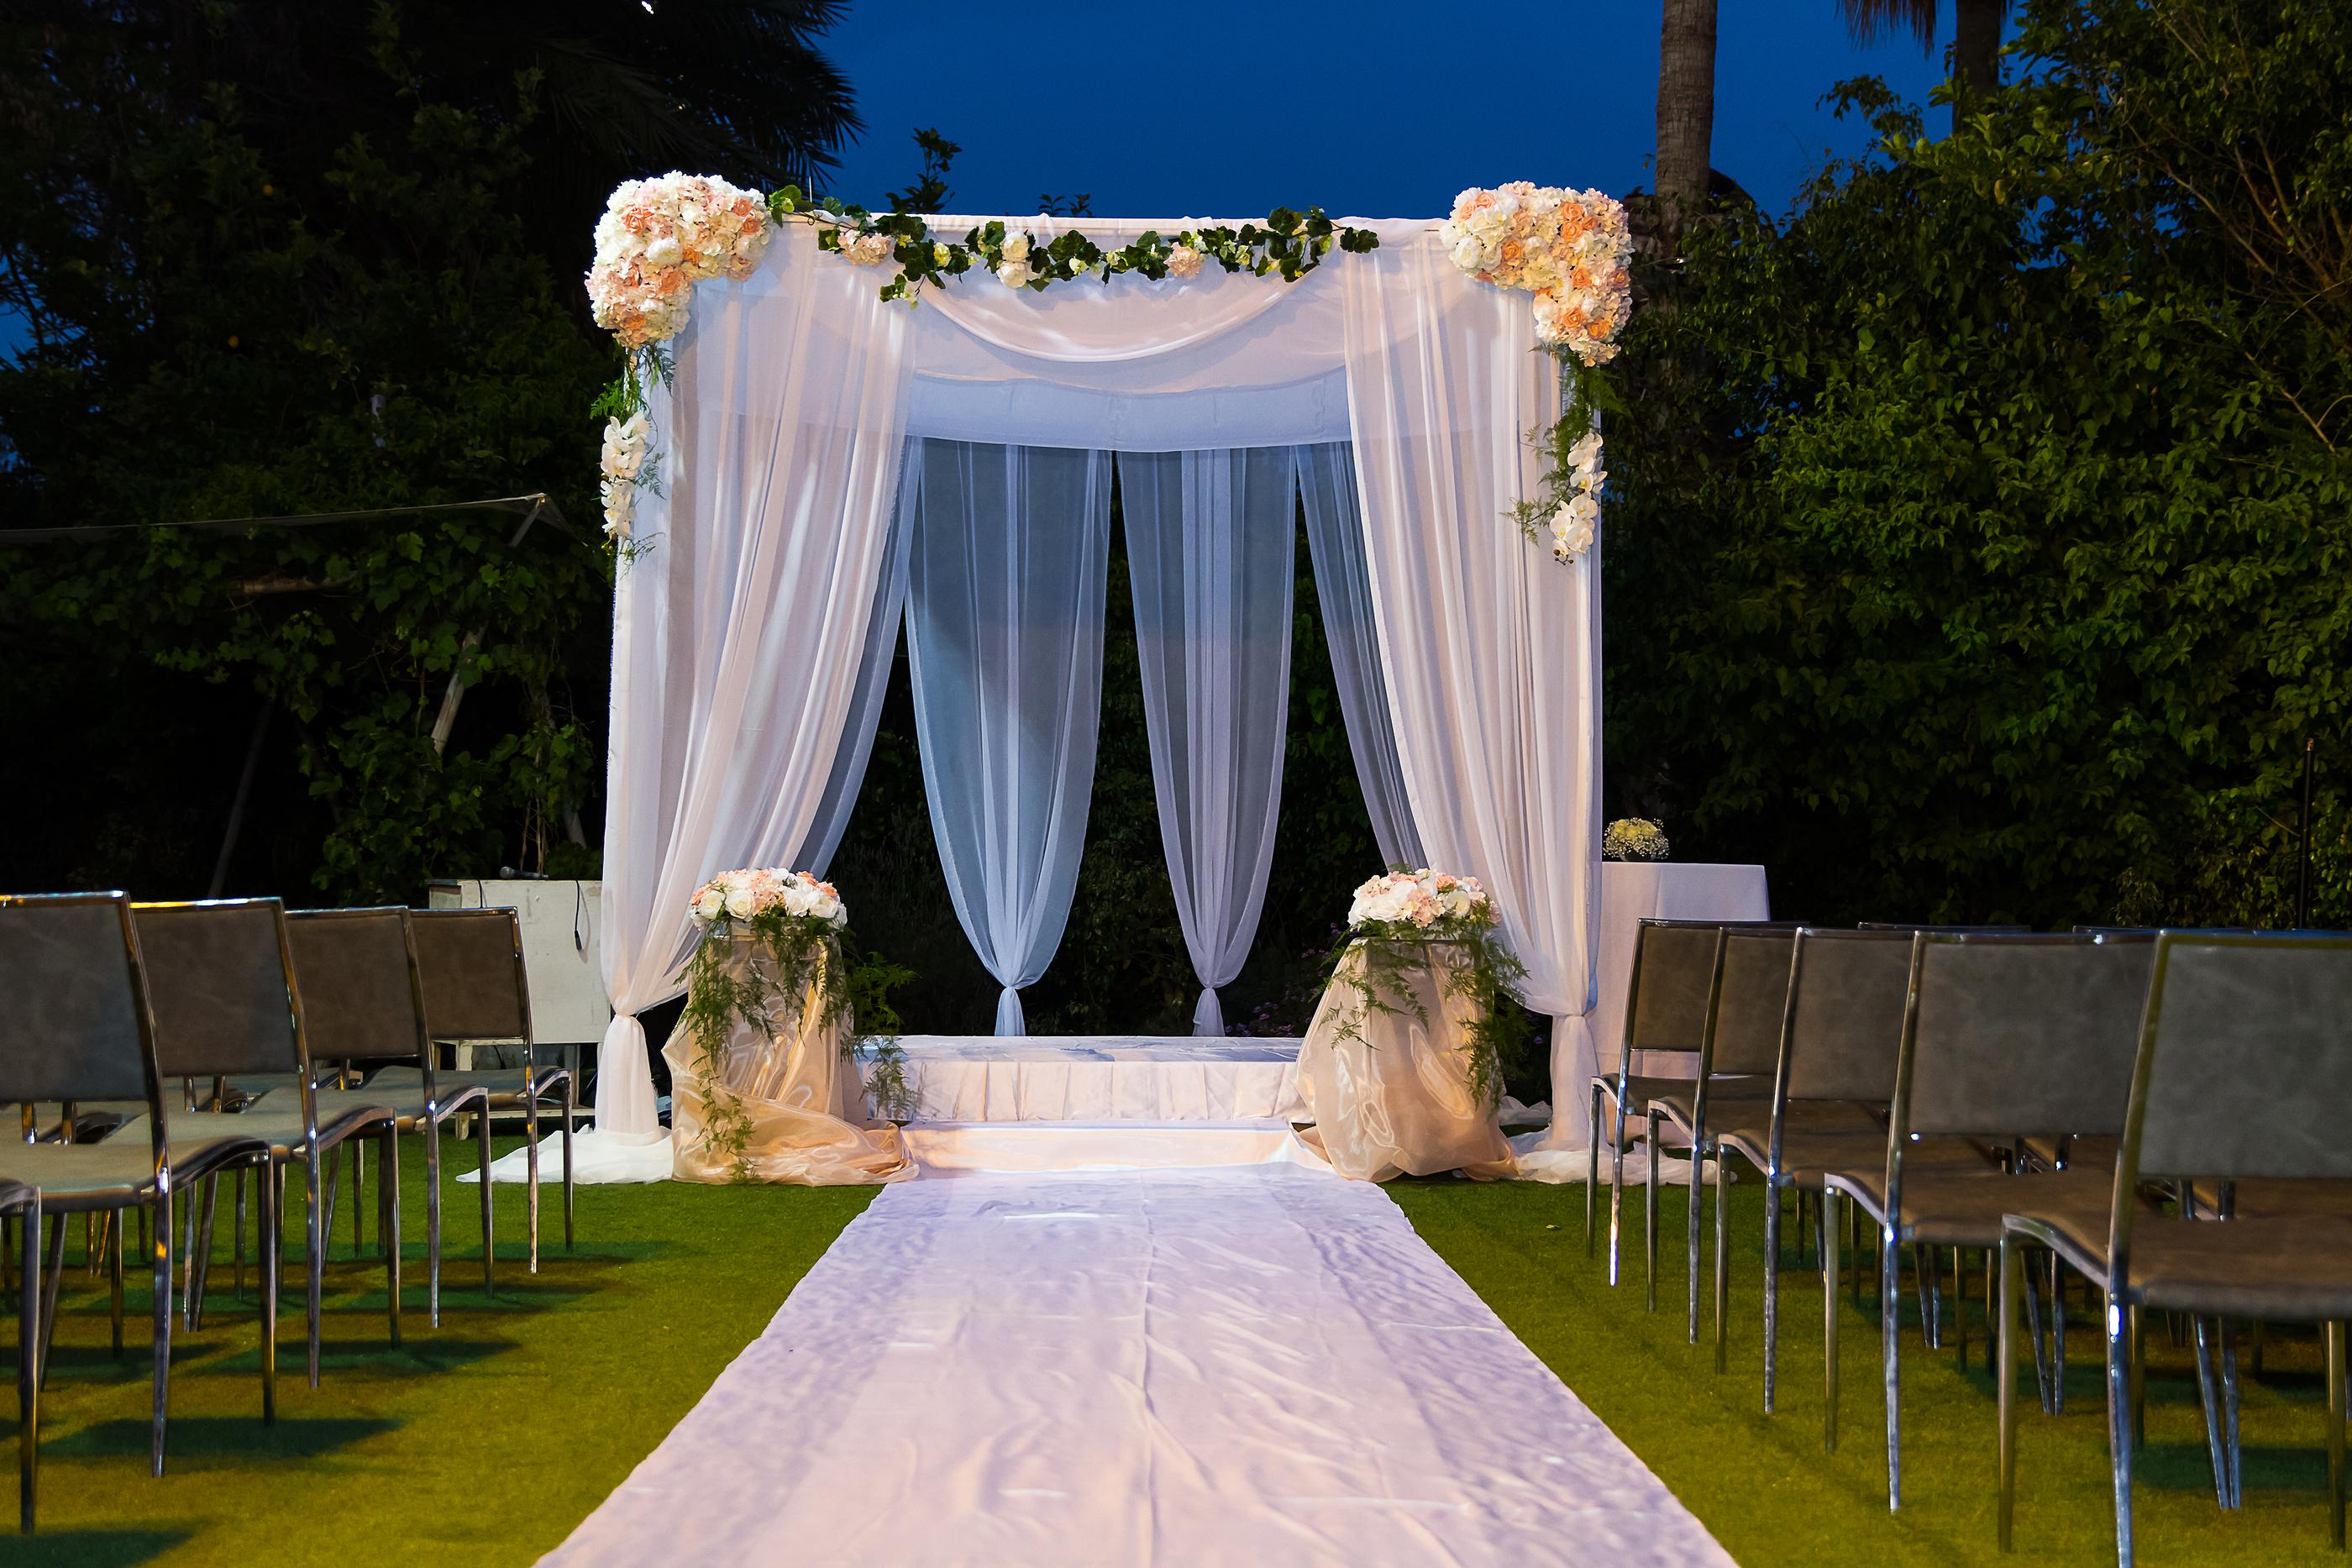 northwest Indiana wedding planners